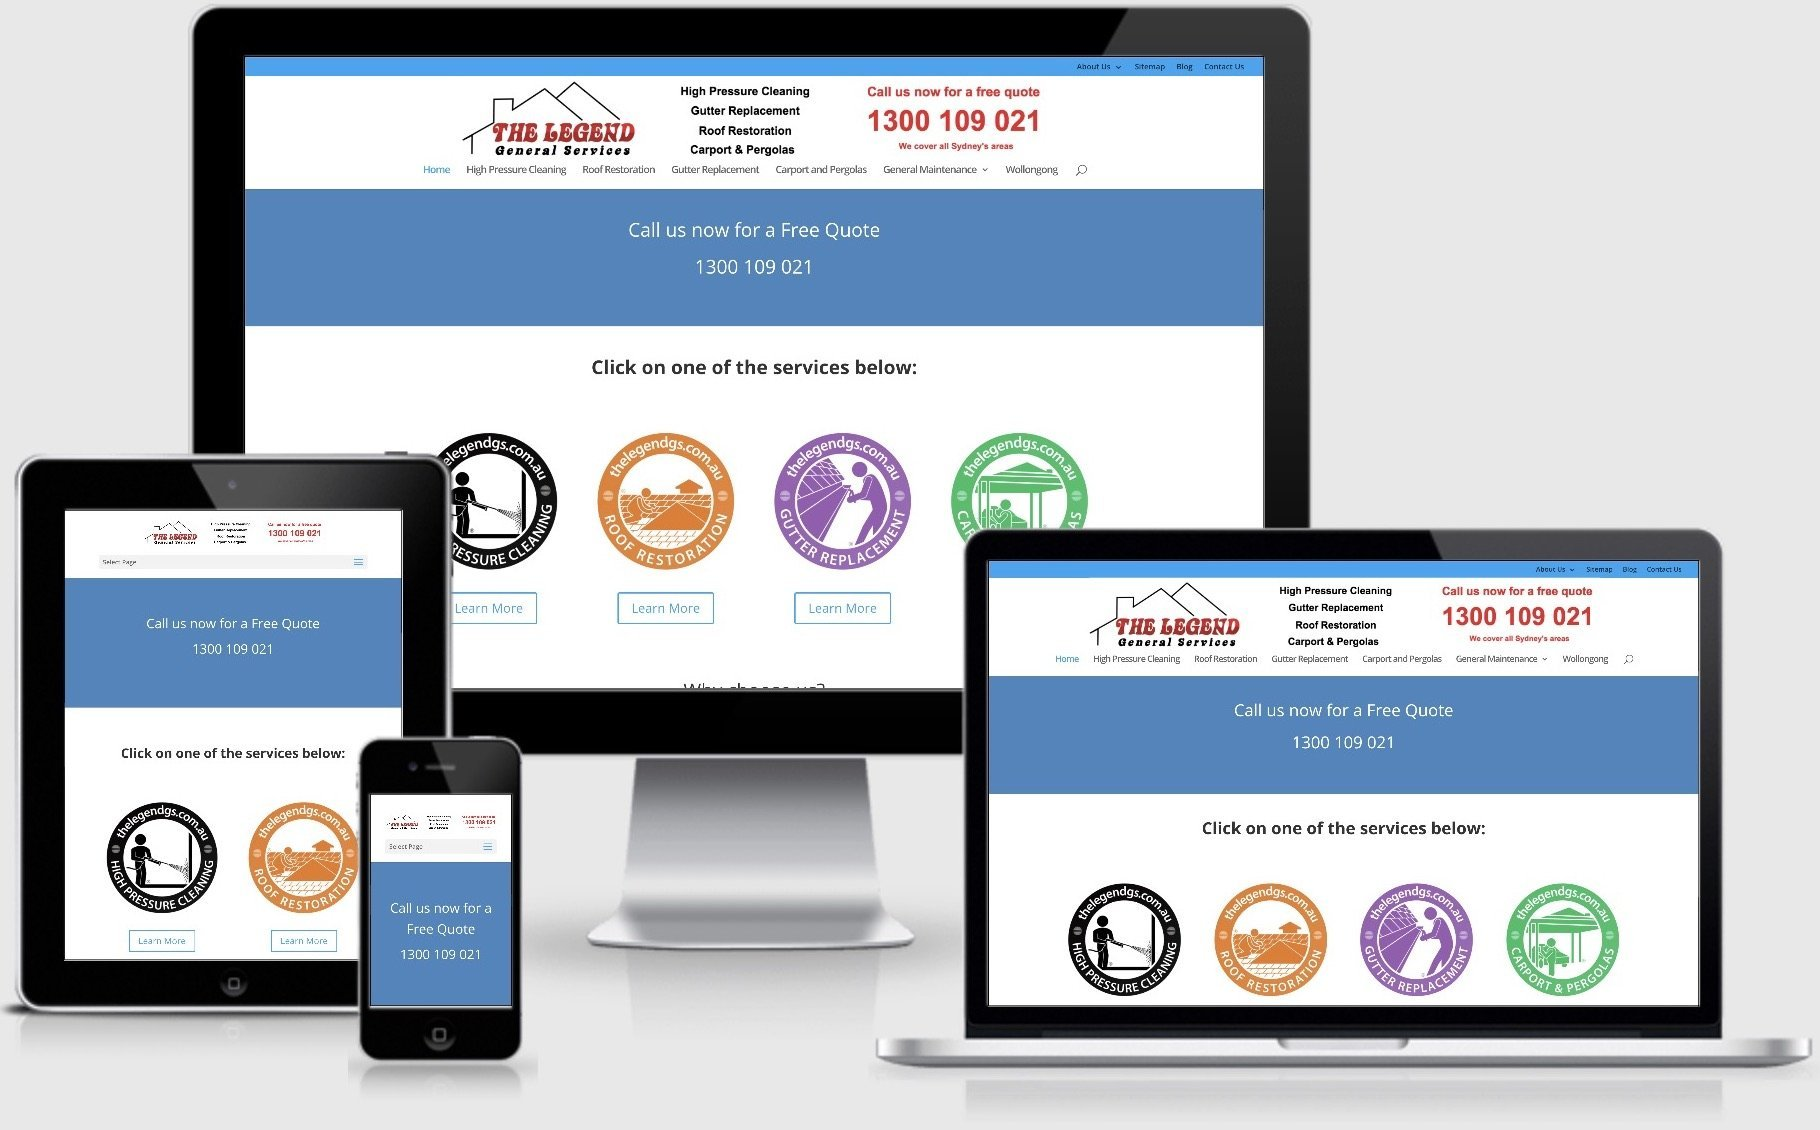 Marketing-Squad-LGS-Websites